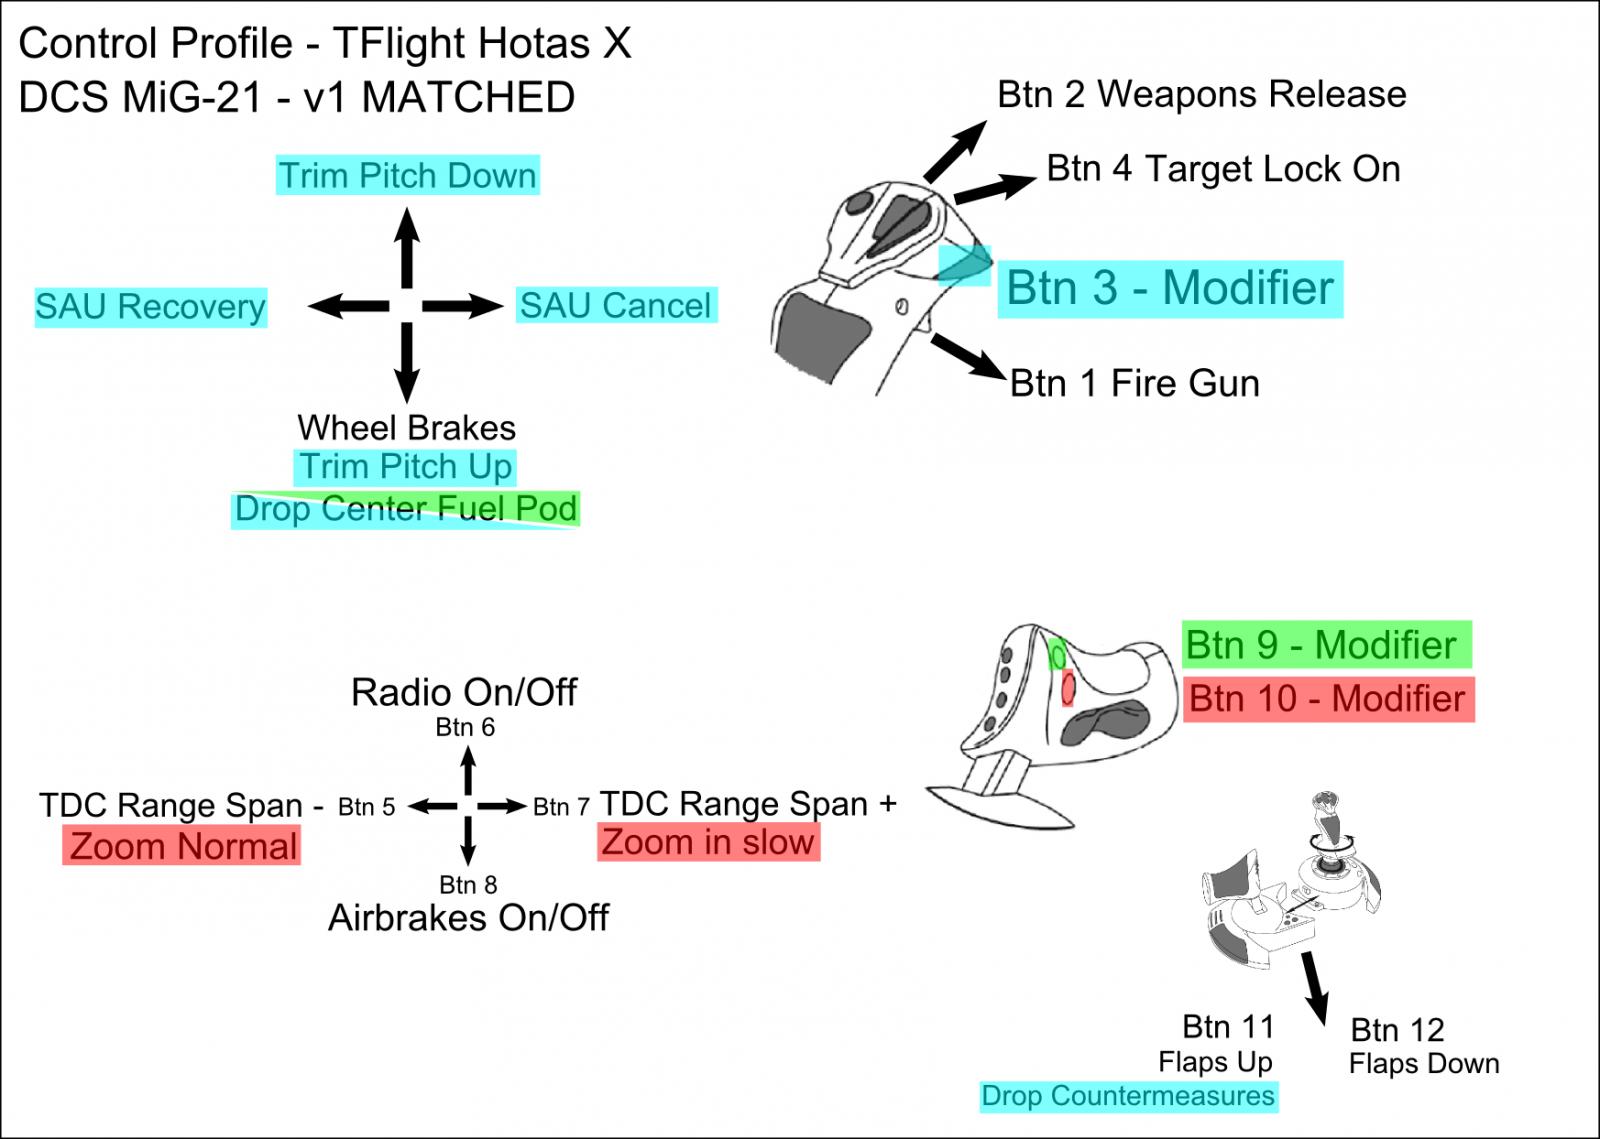 Control Profile: Thrustmaster TFlight HOTAS X